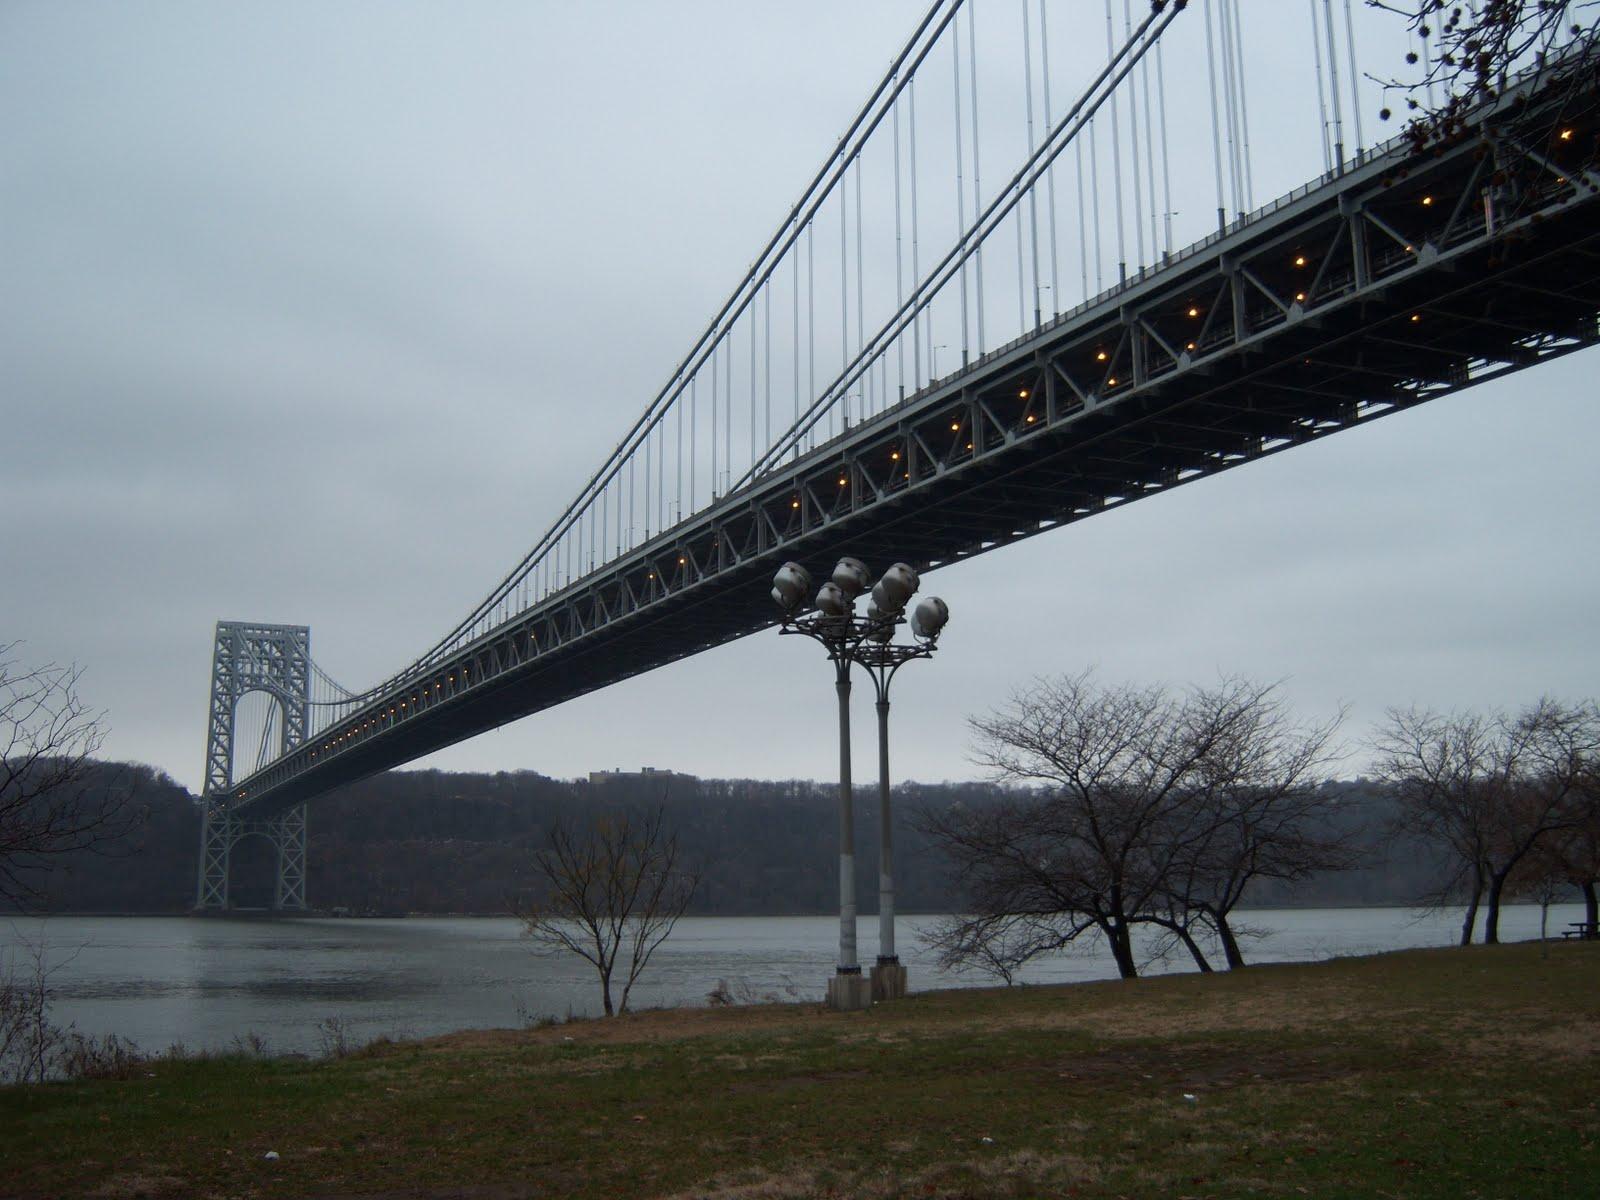 The Bridge to Everywhere: The George Washington Bridge